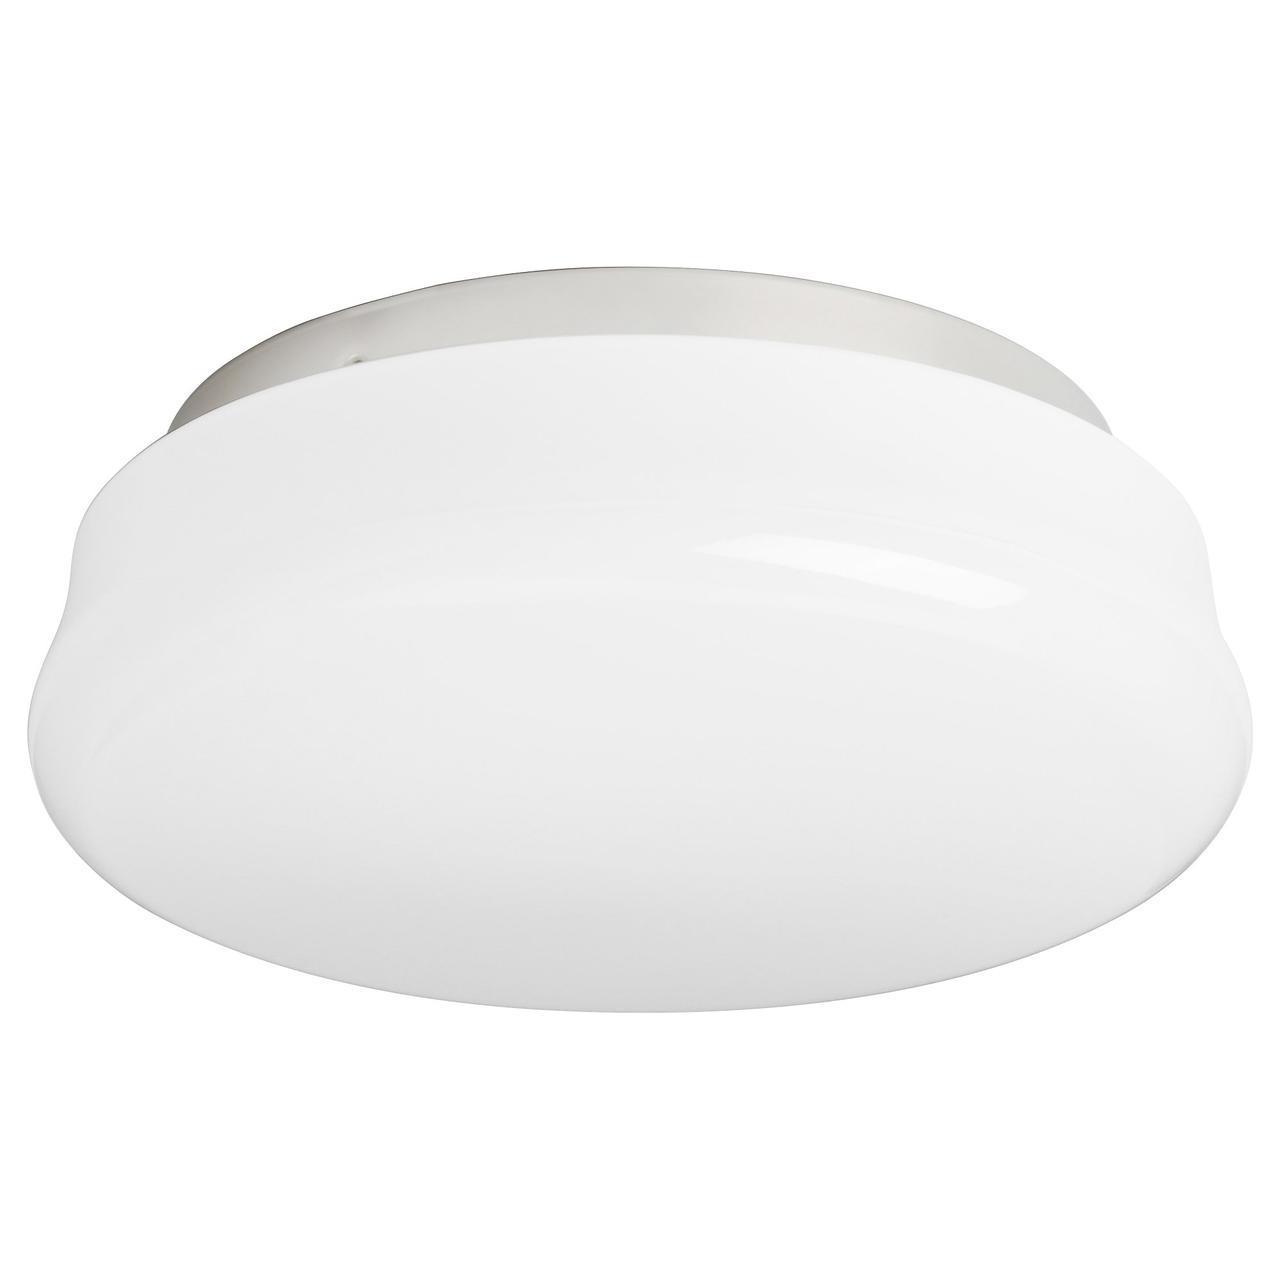 ✅ IKEA GASGRUND (402.238.57) Потолочная лампа, опаловый белый